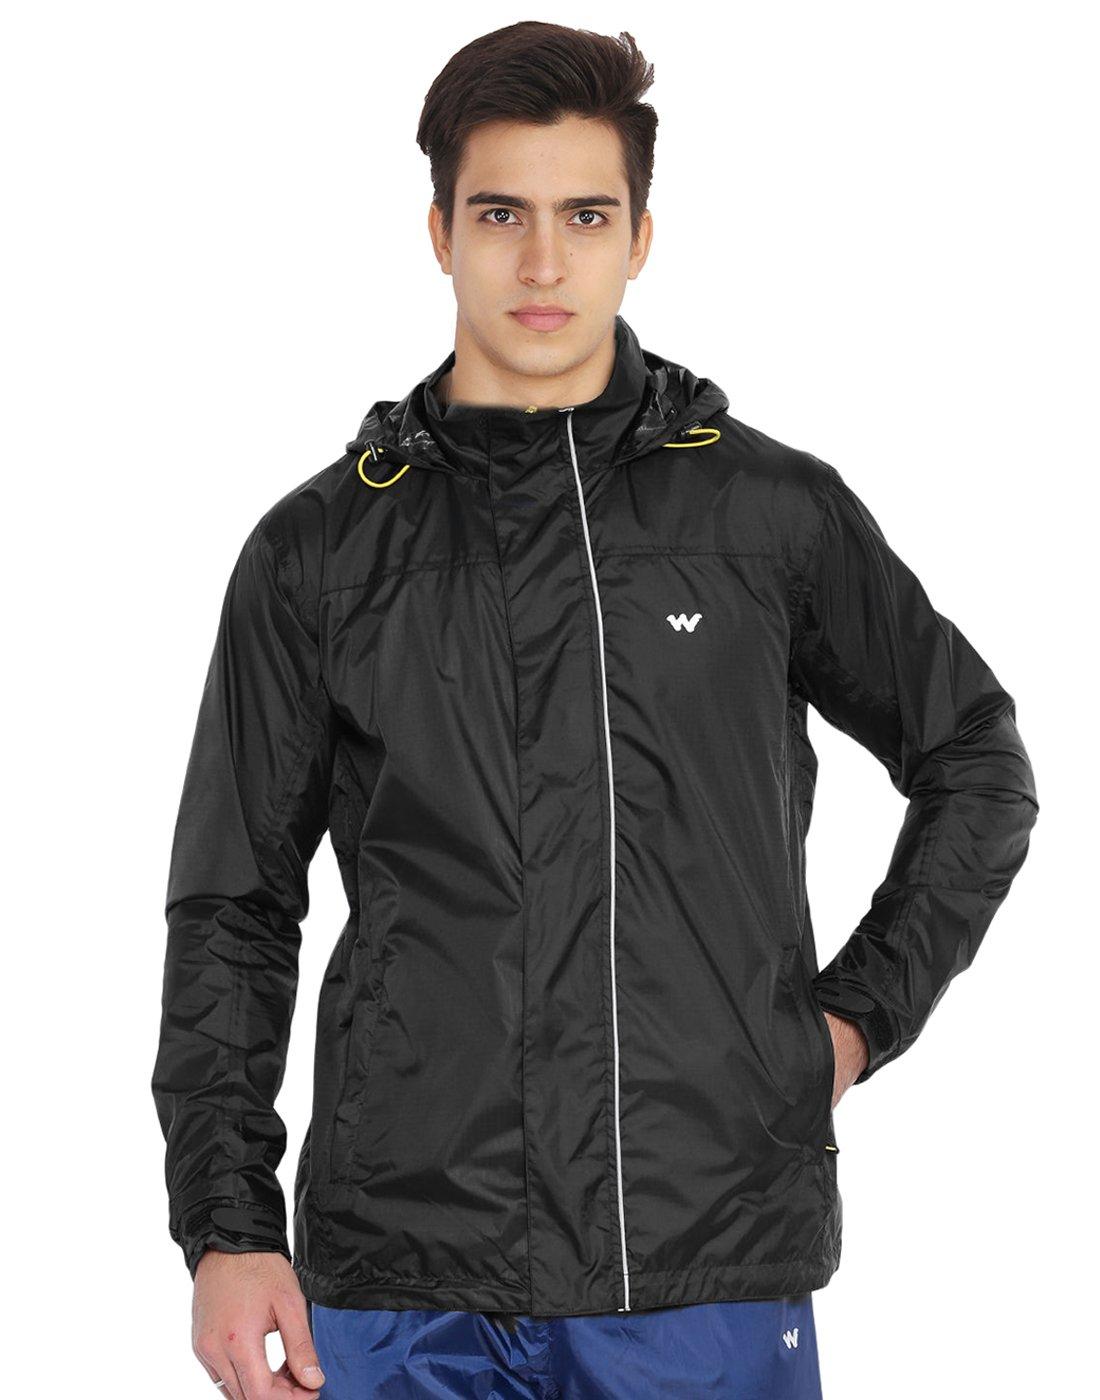 309beea34 Wildcraft Men Black Rain Pro Jacket: Amazon.in: Sports, Fitness ...